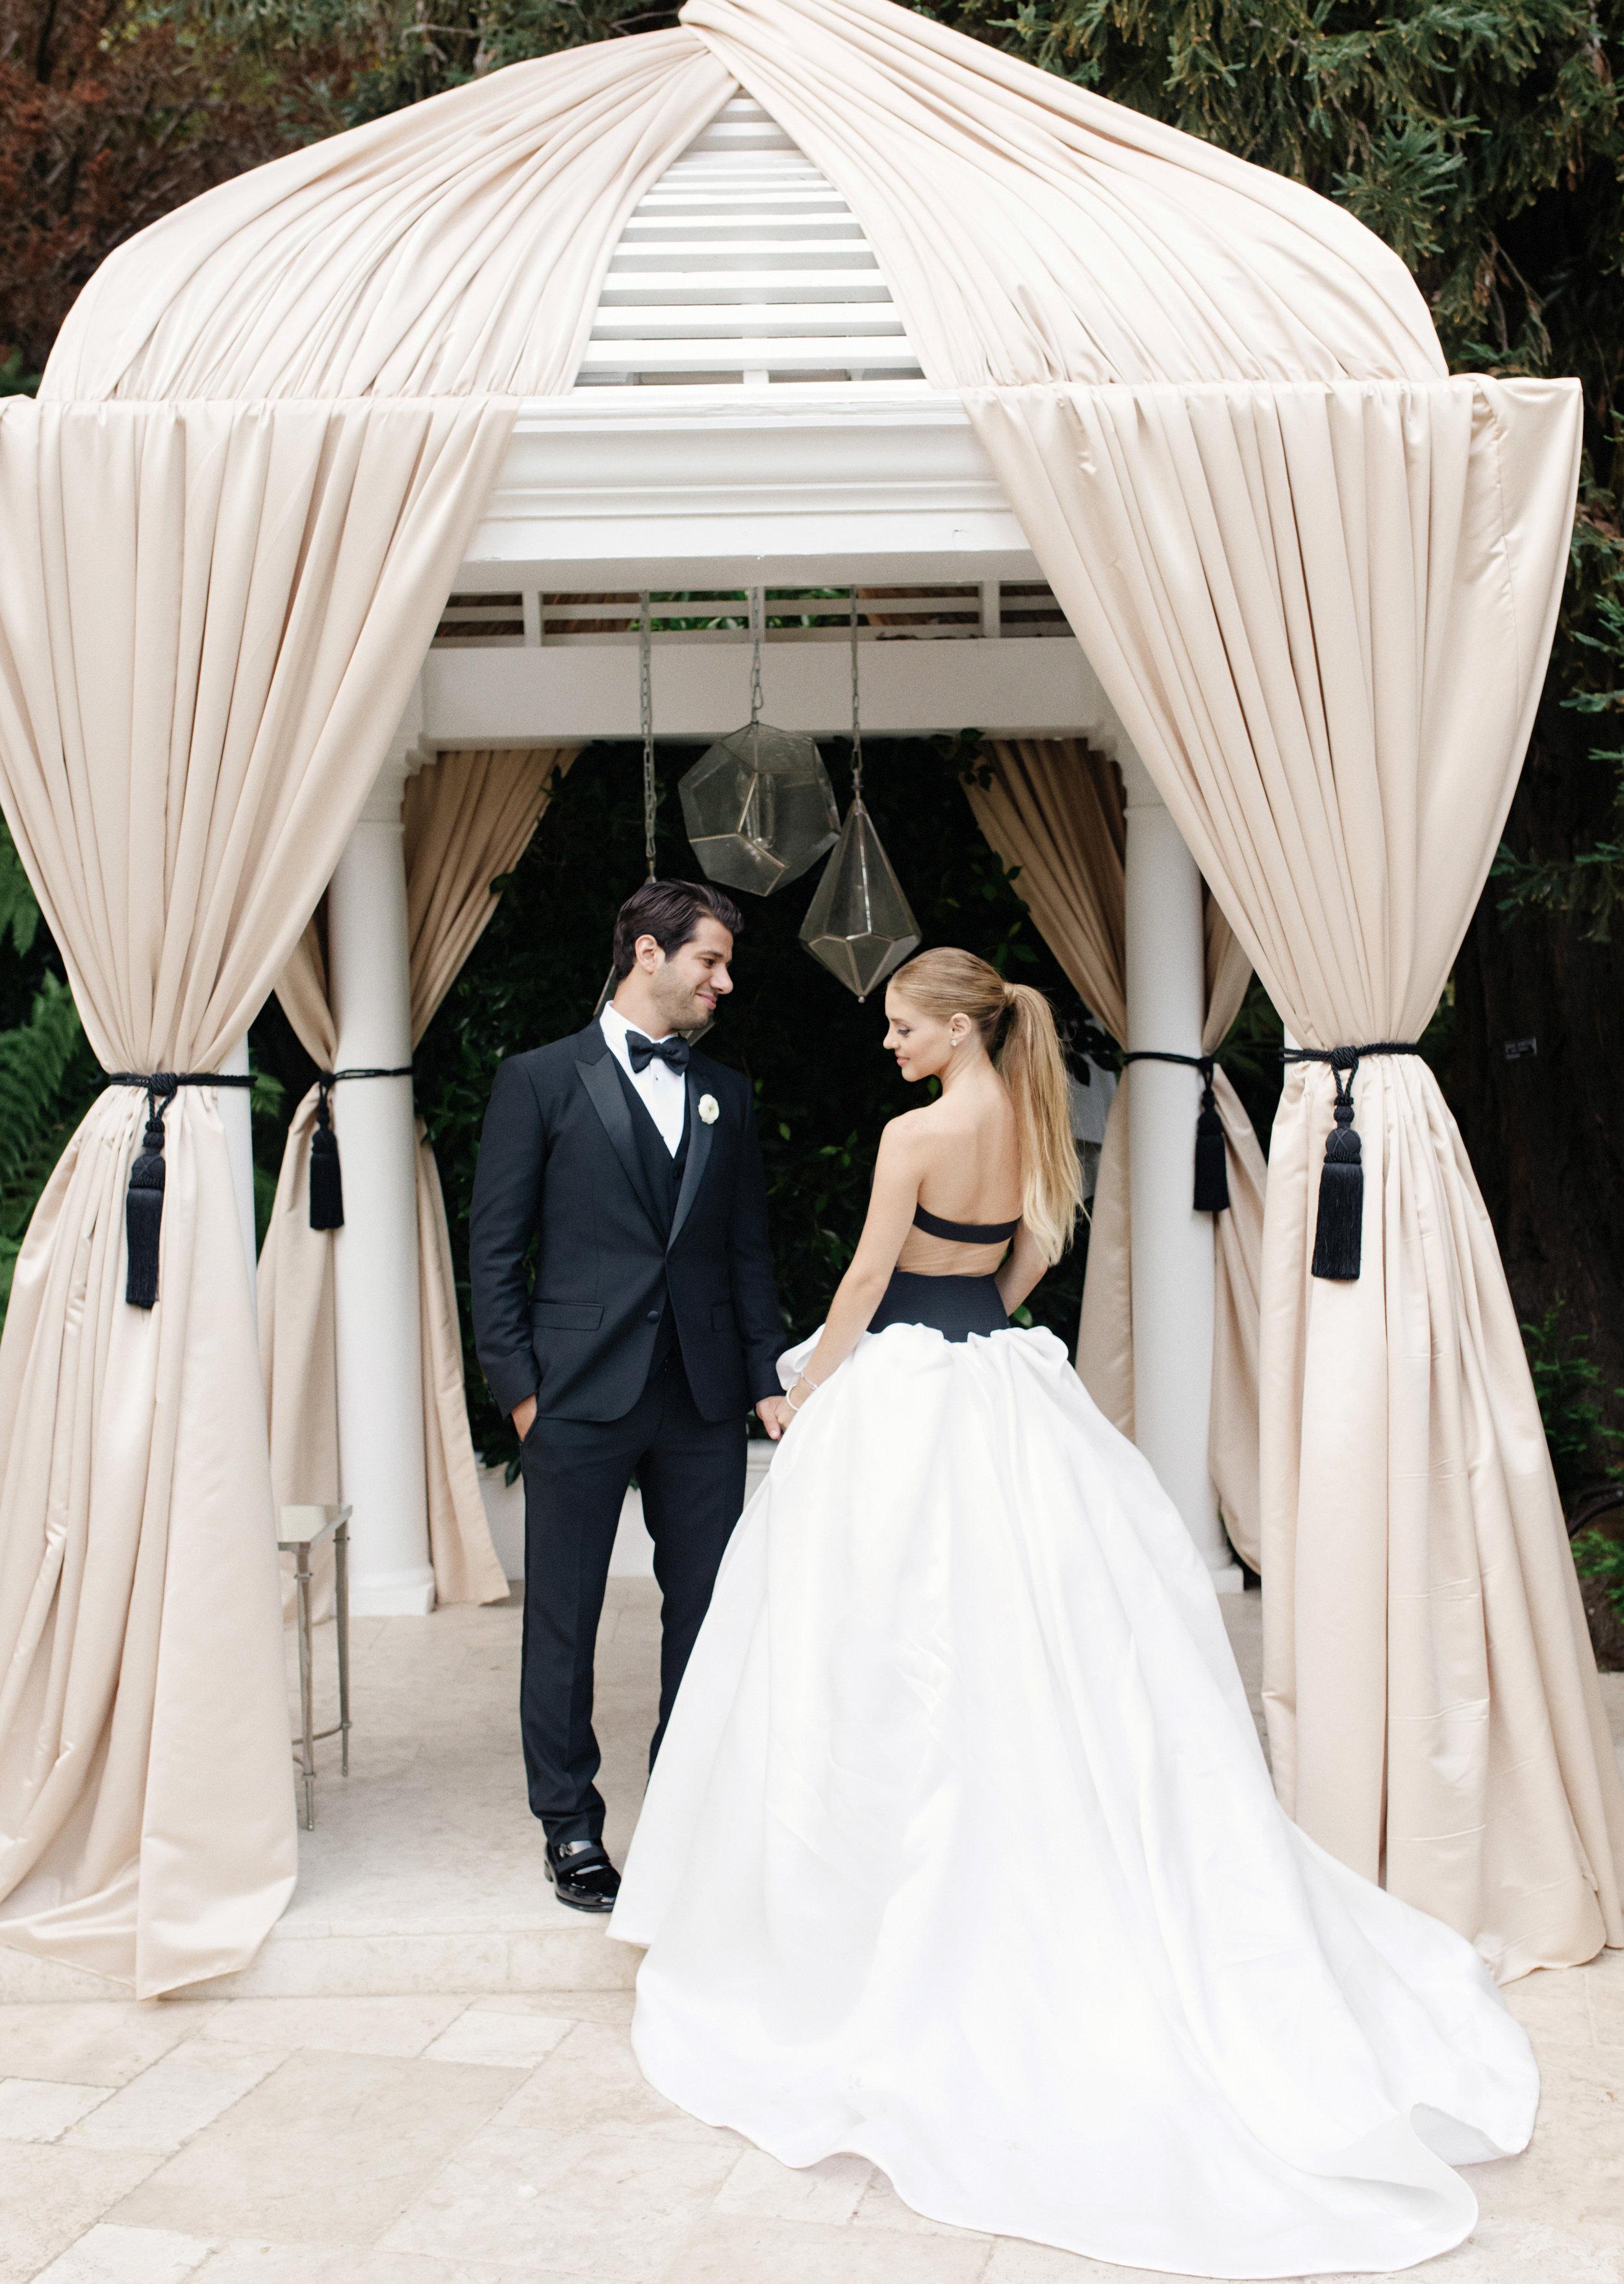 BEL-AIR | WEDDING